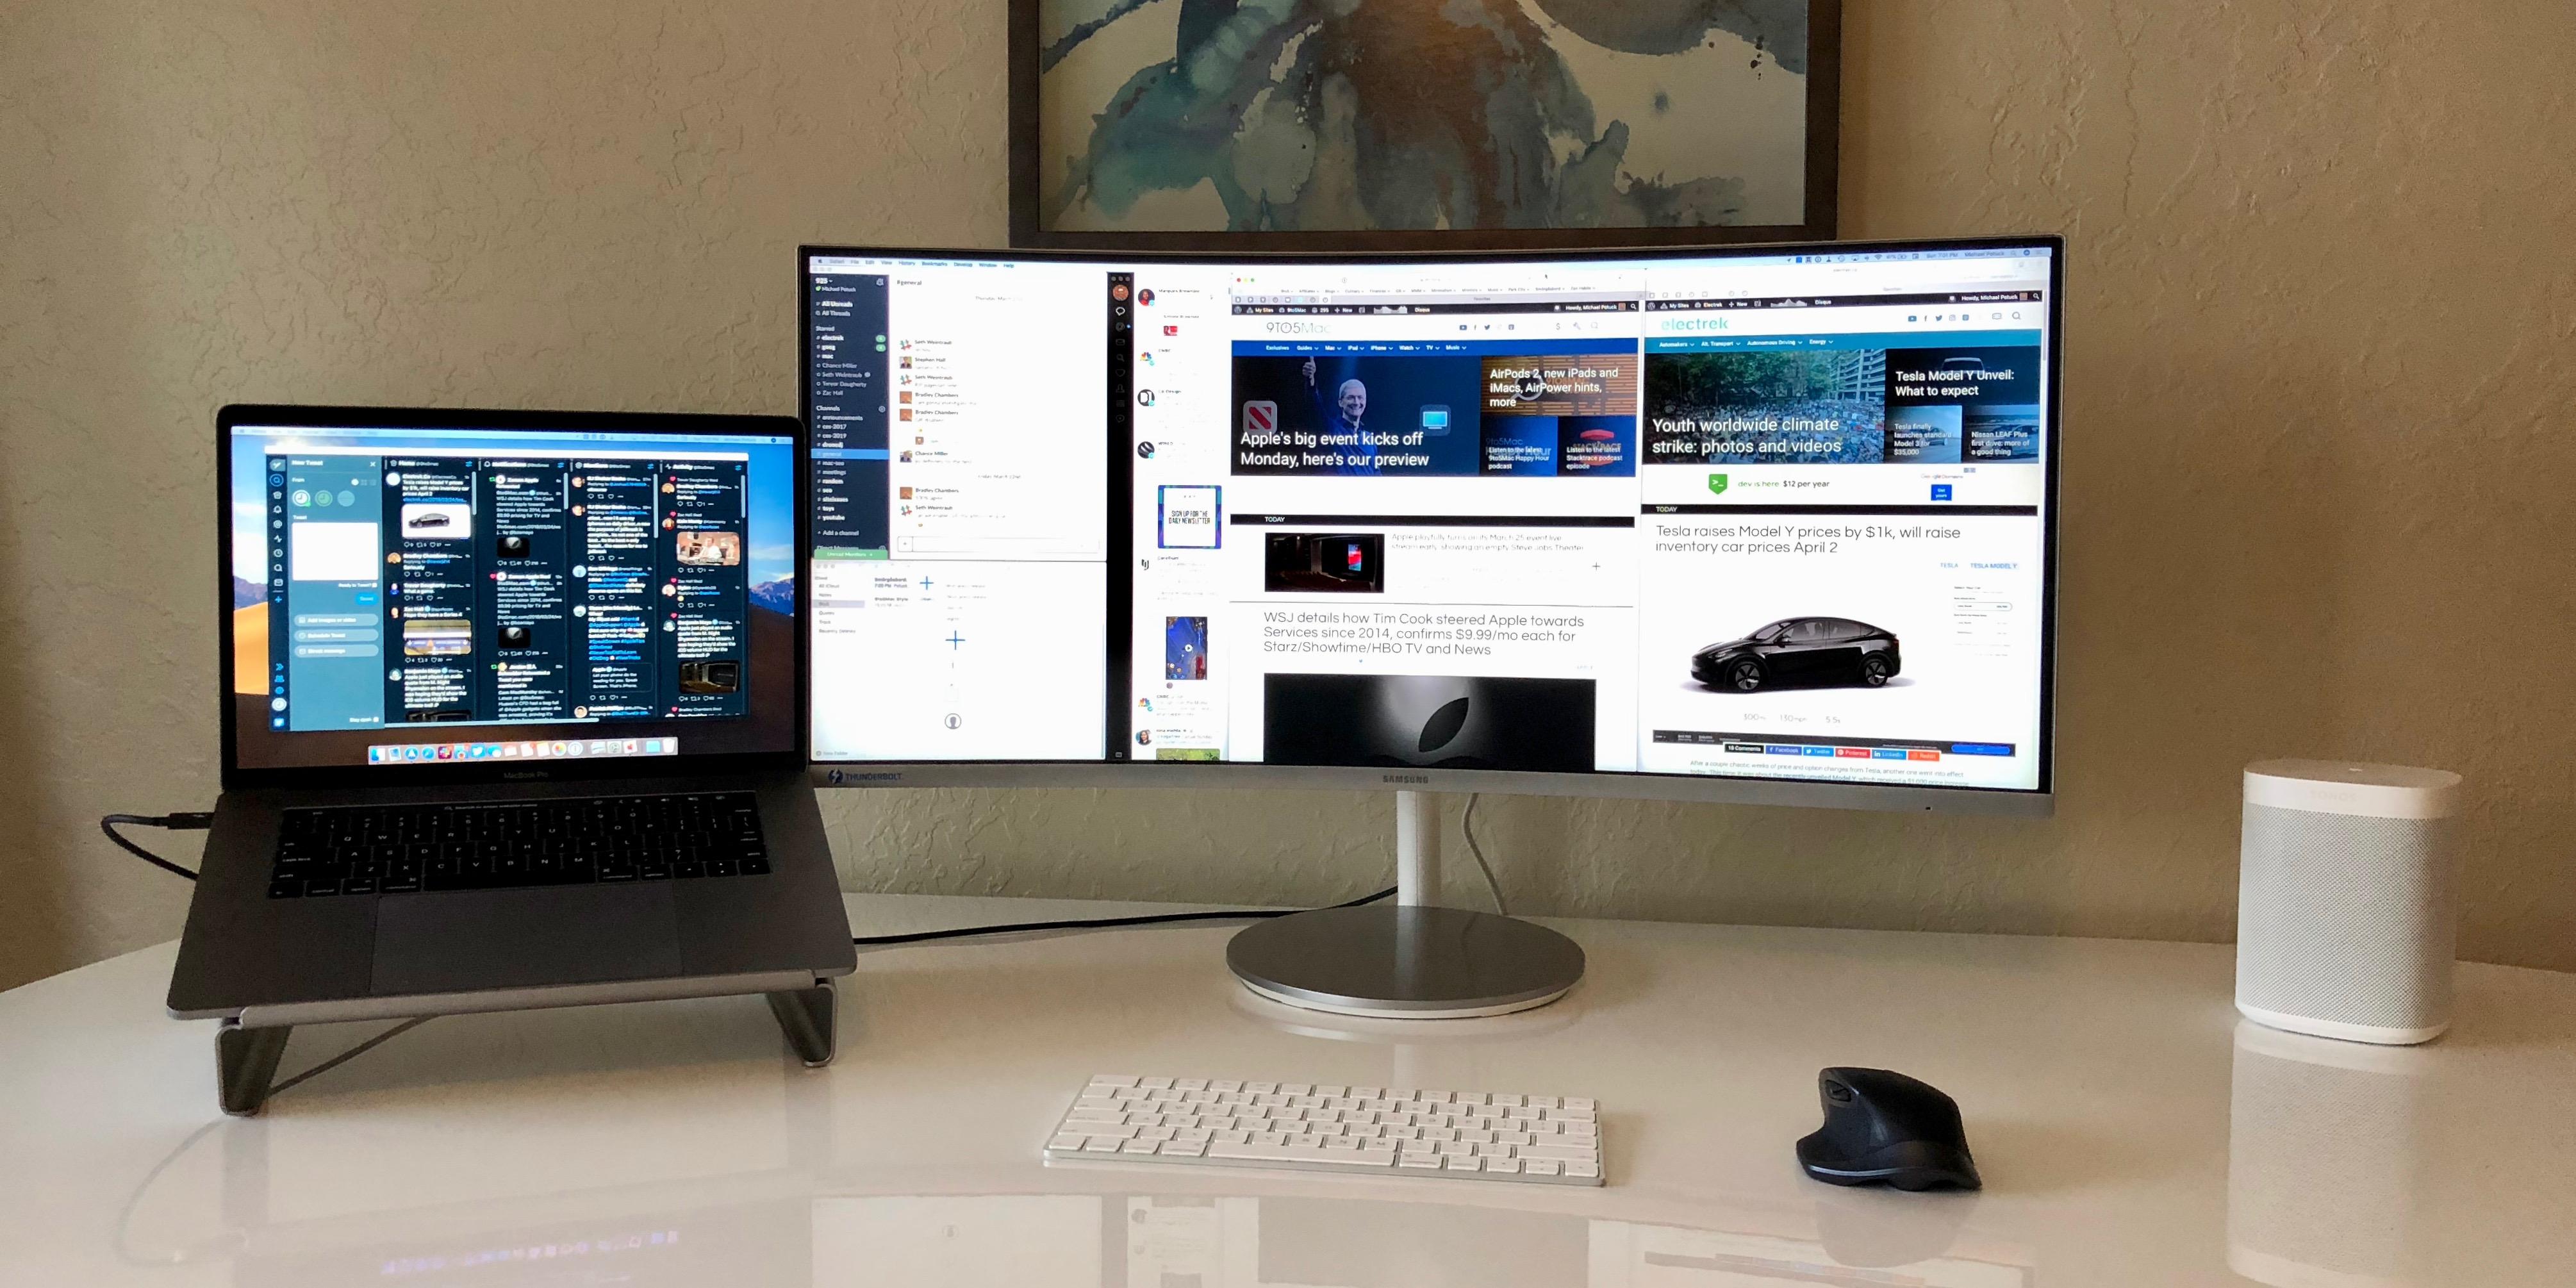 Thunderbolt 3 ultra wide monitor